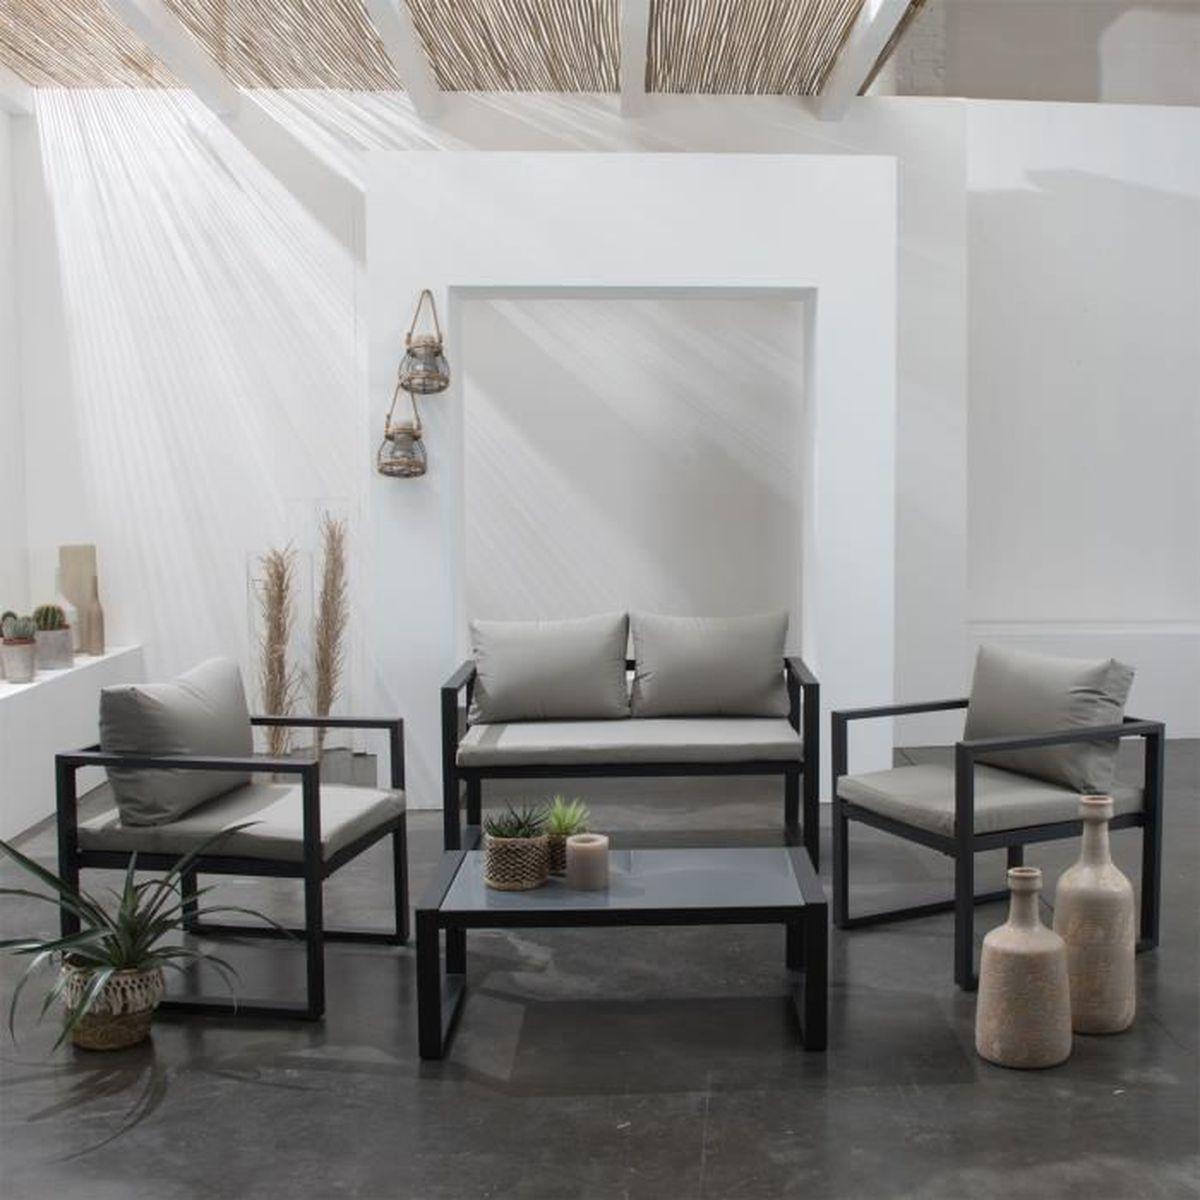 Salon de jardin IBIZA en tissu gris 4 places - aluminum anthracite